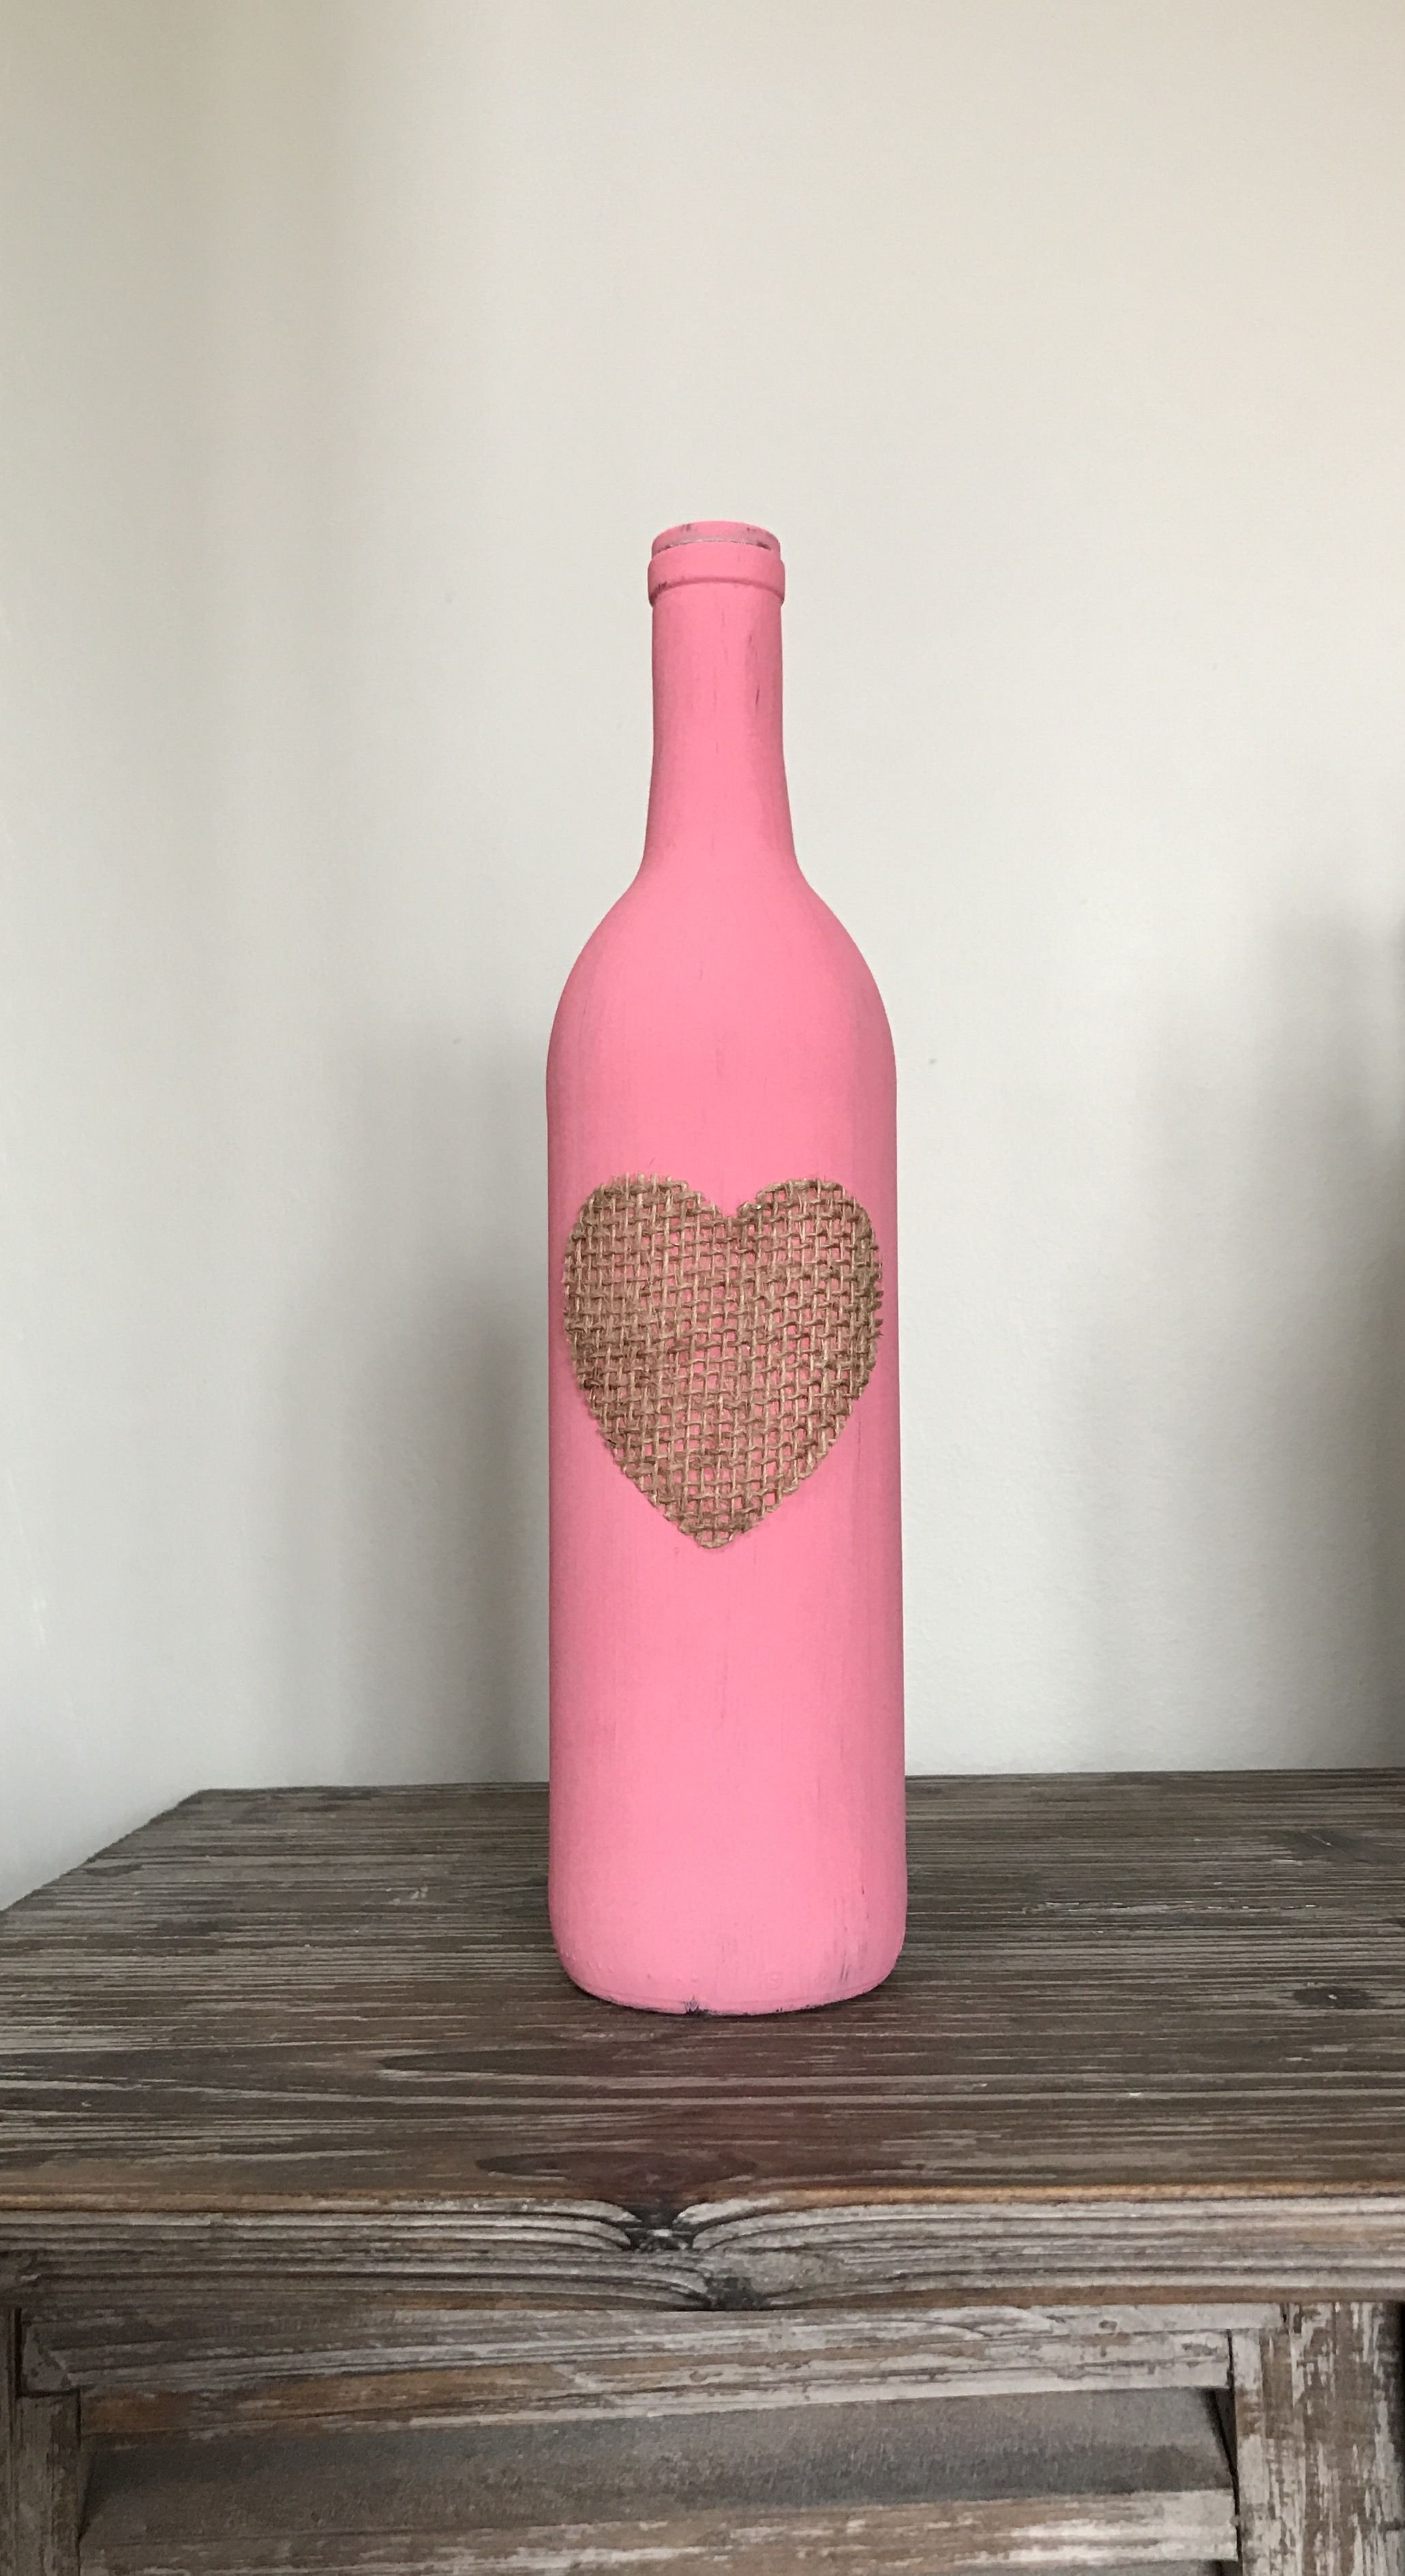 Acrylic Painted Wine Bottle Pink Burlap Heart Valentines Day Love Valentines Wine Bottle Crafts Wine Bottle Crafts Diy Wine Bottle Decor